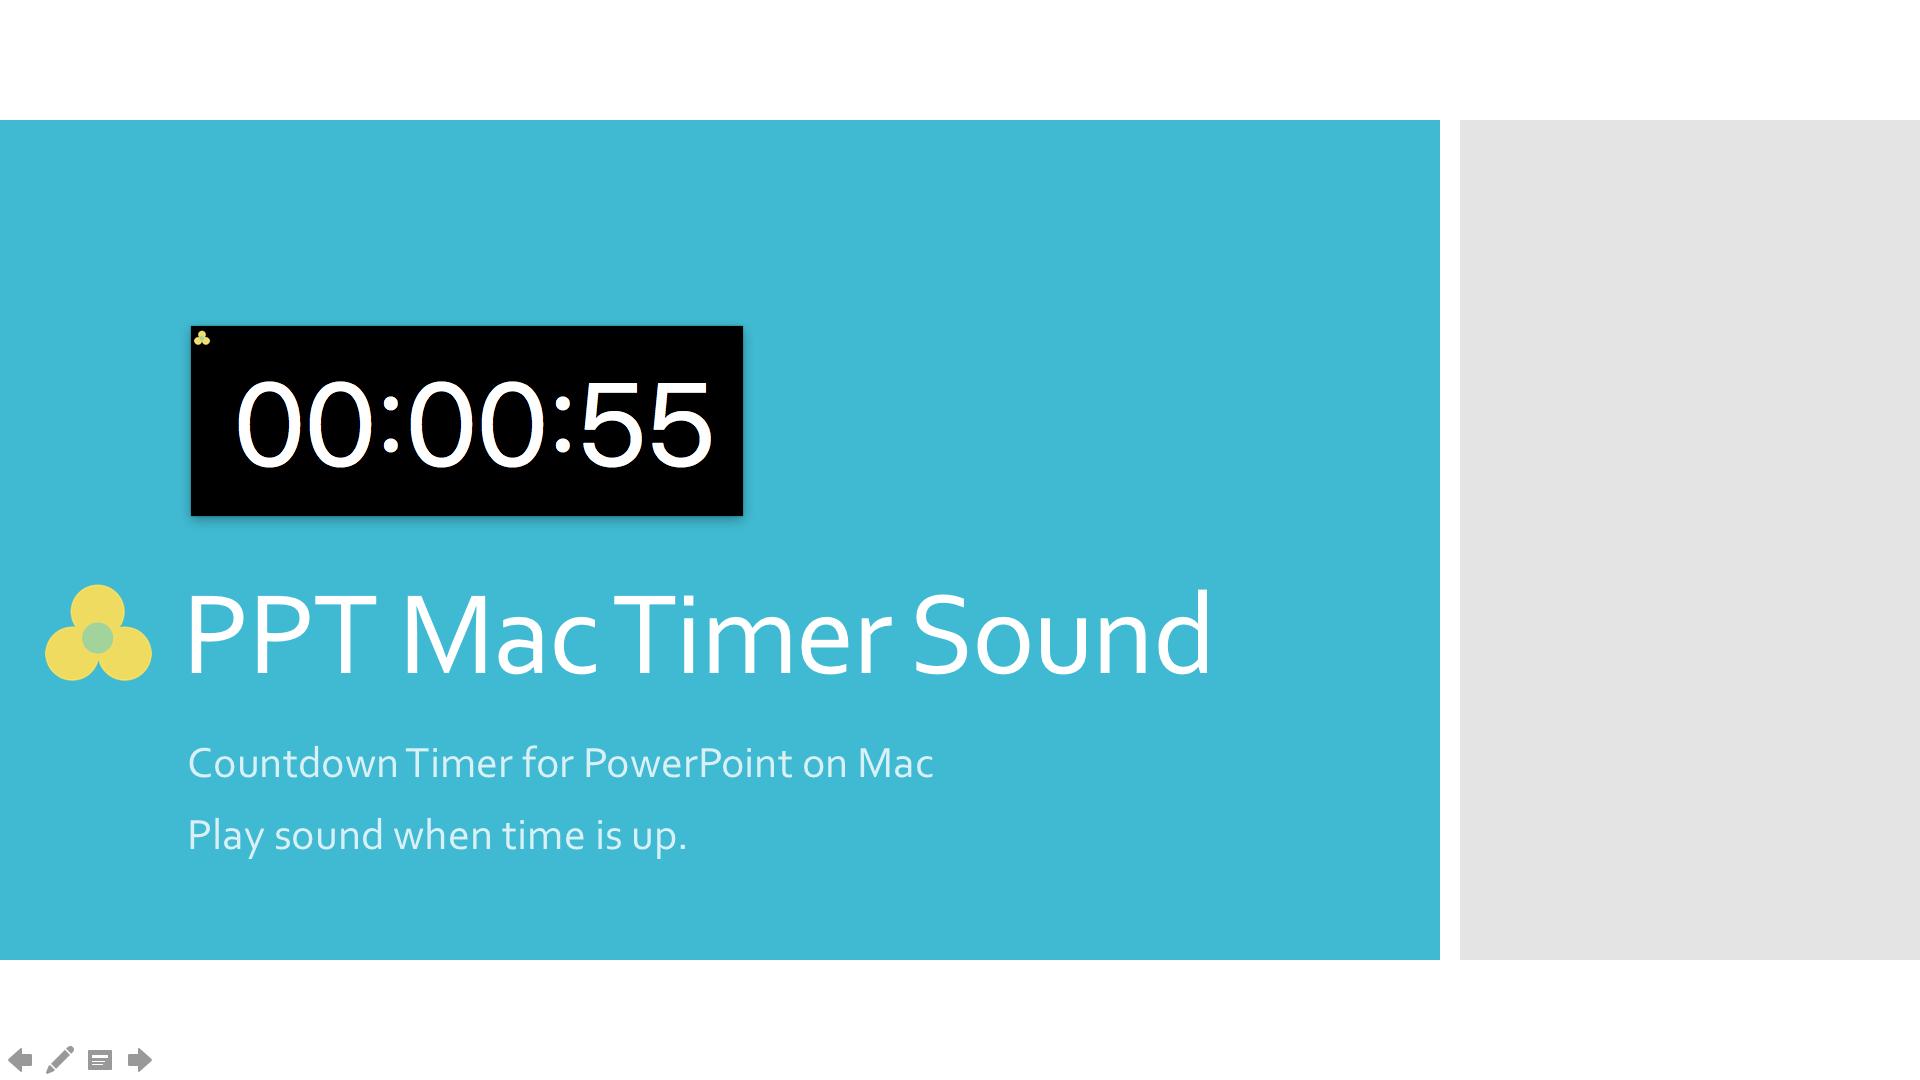 ppt mac timer sound - ltc clock, Powerpoint templates